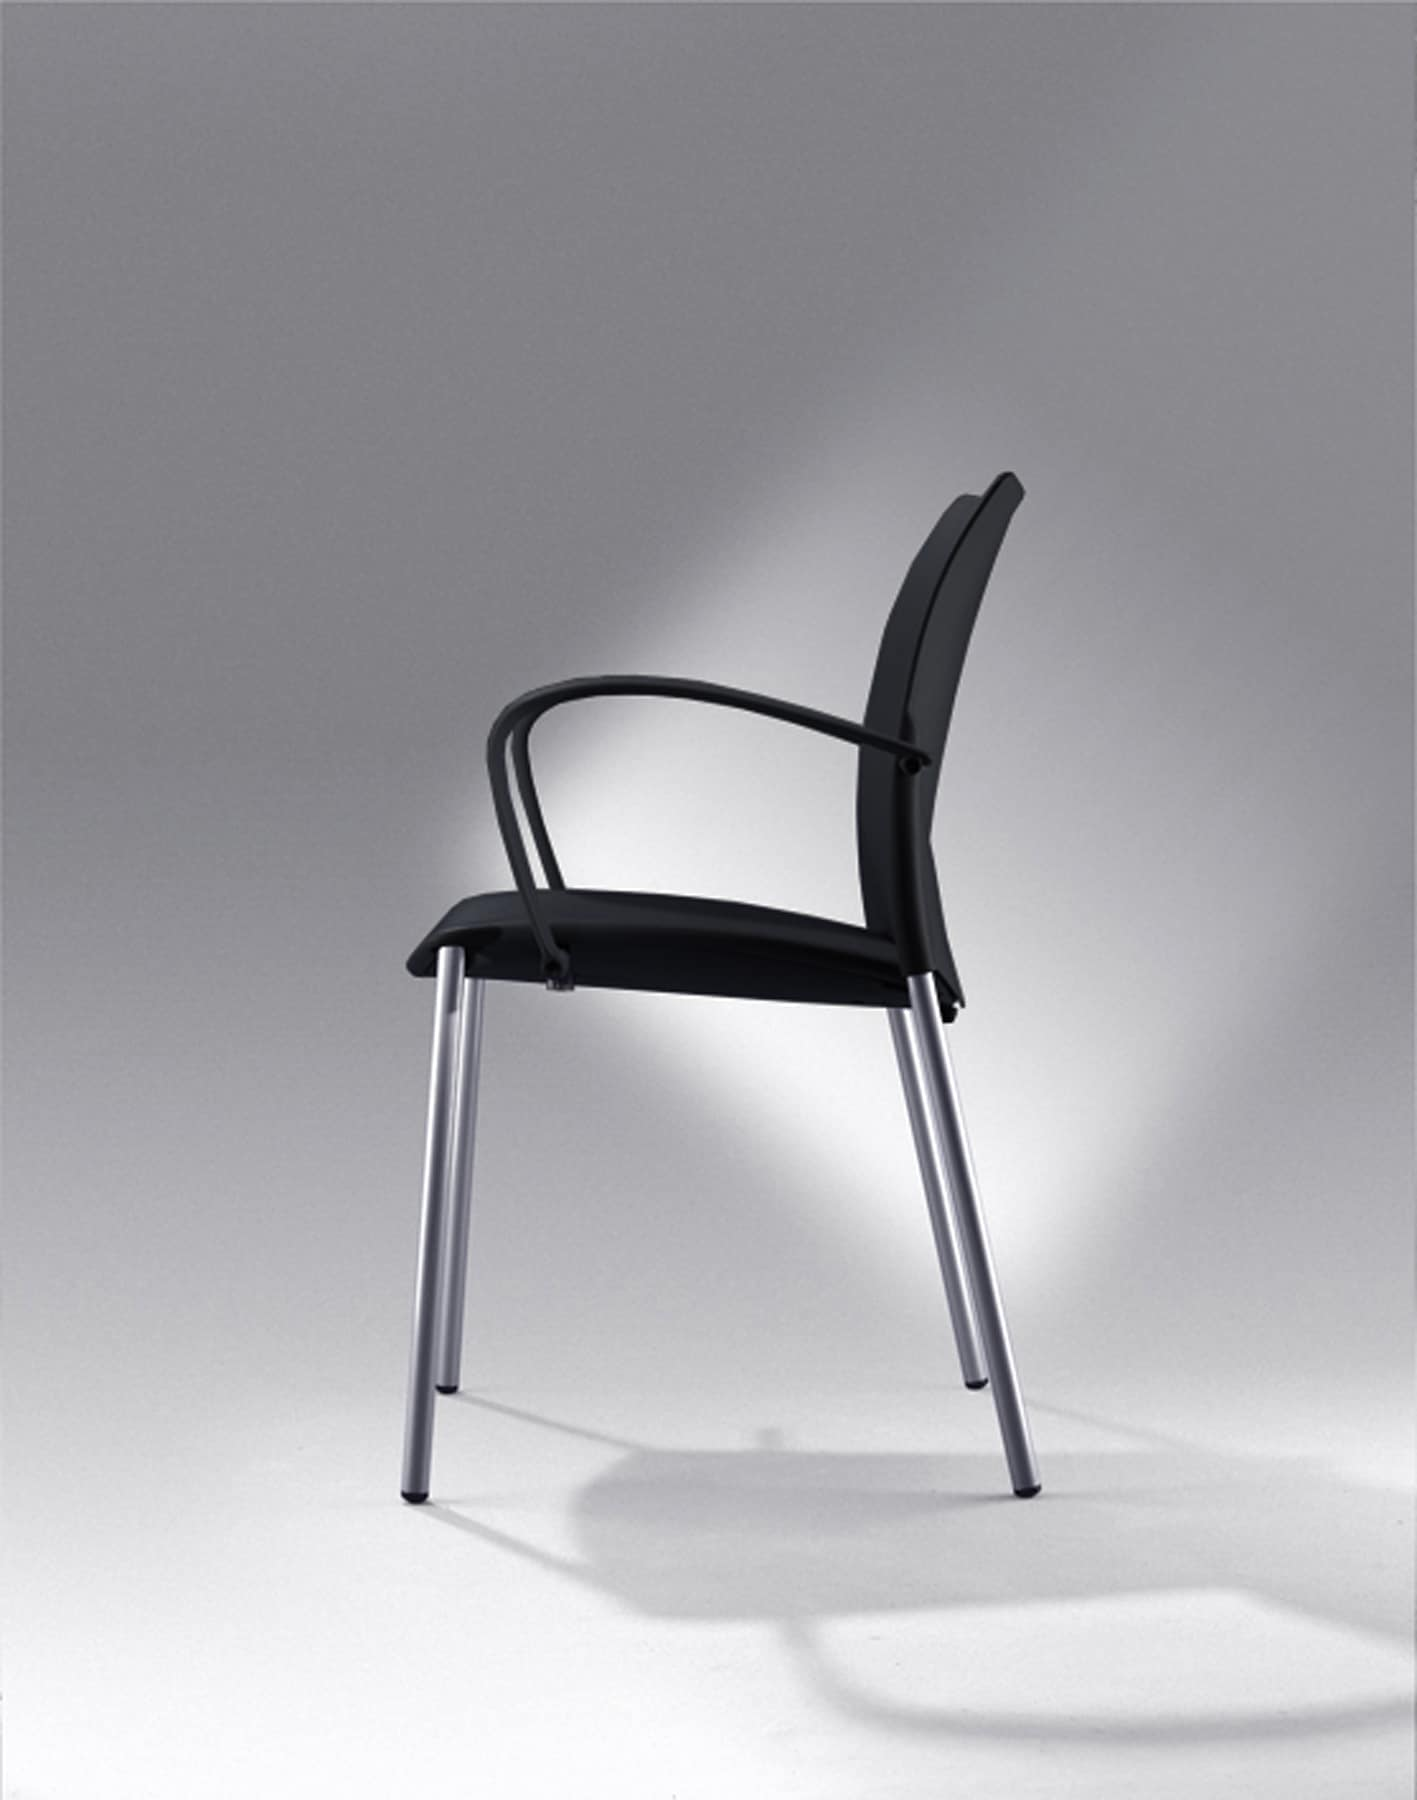 Global chaise